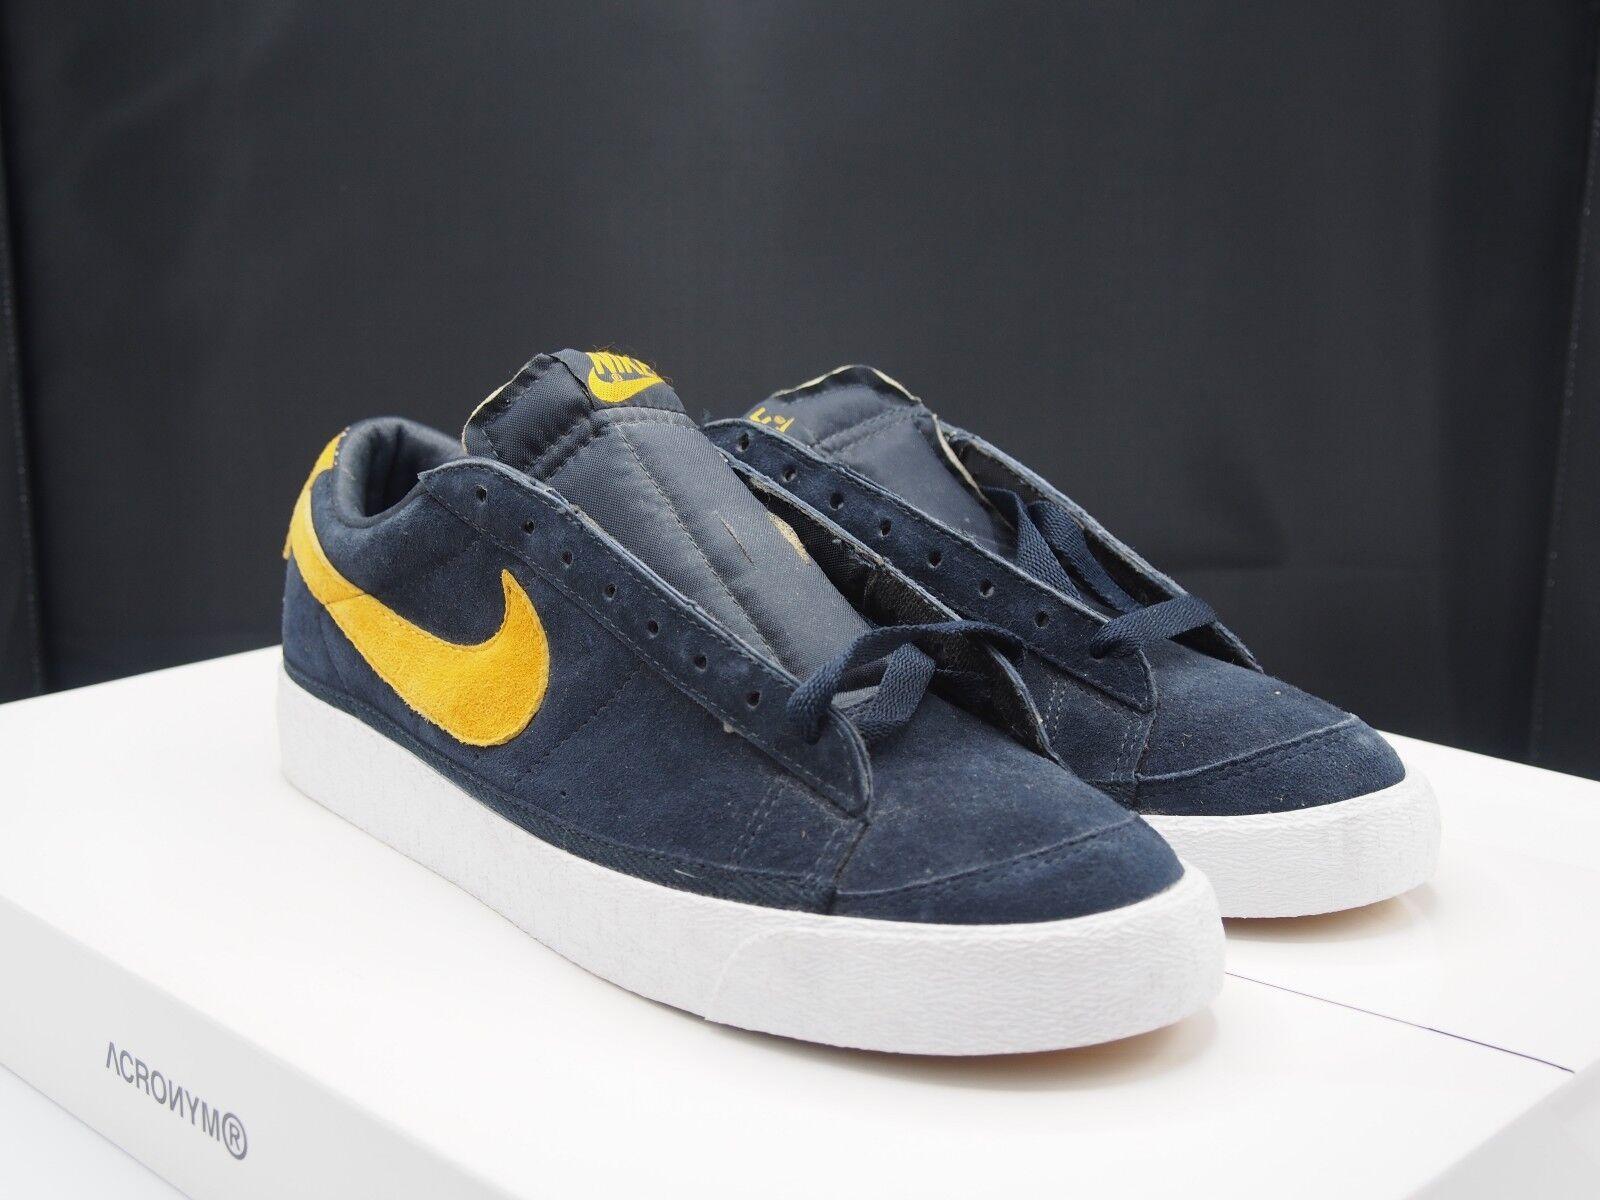 cab6e211500 Nike Blazer Suede Low OG Sol 305415-471 Del Obsidian nxpdai833-Athletic  Shoes